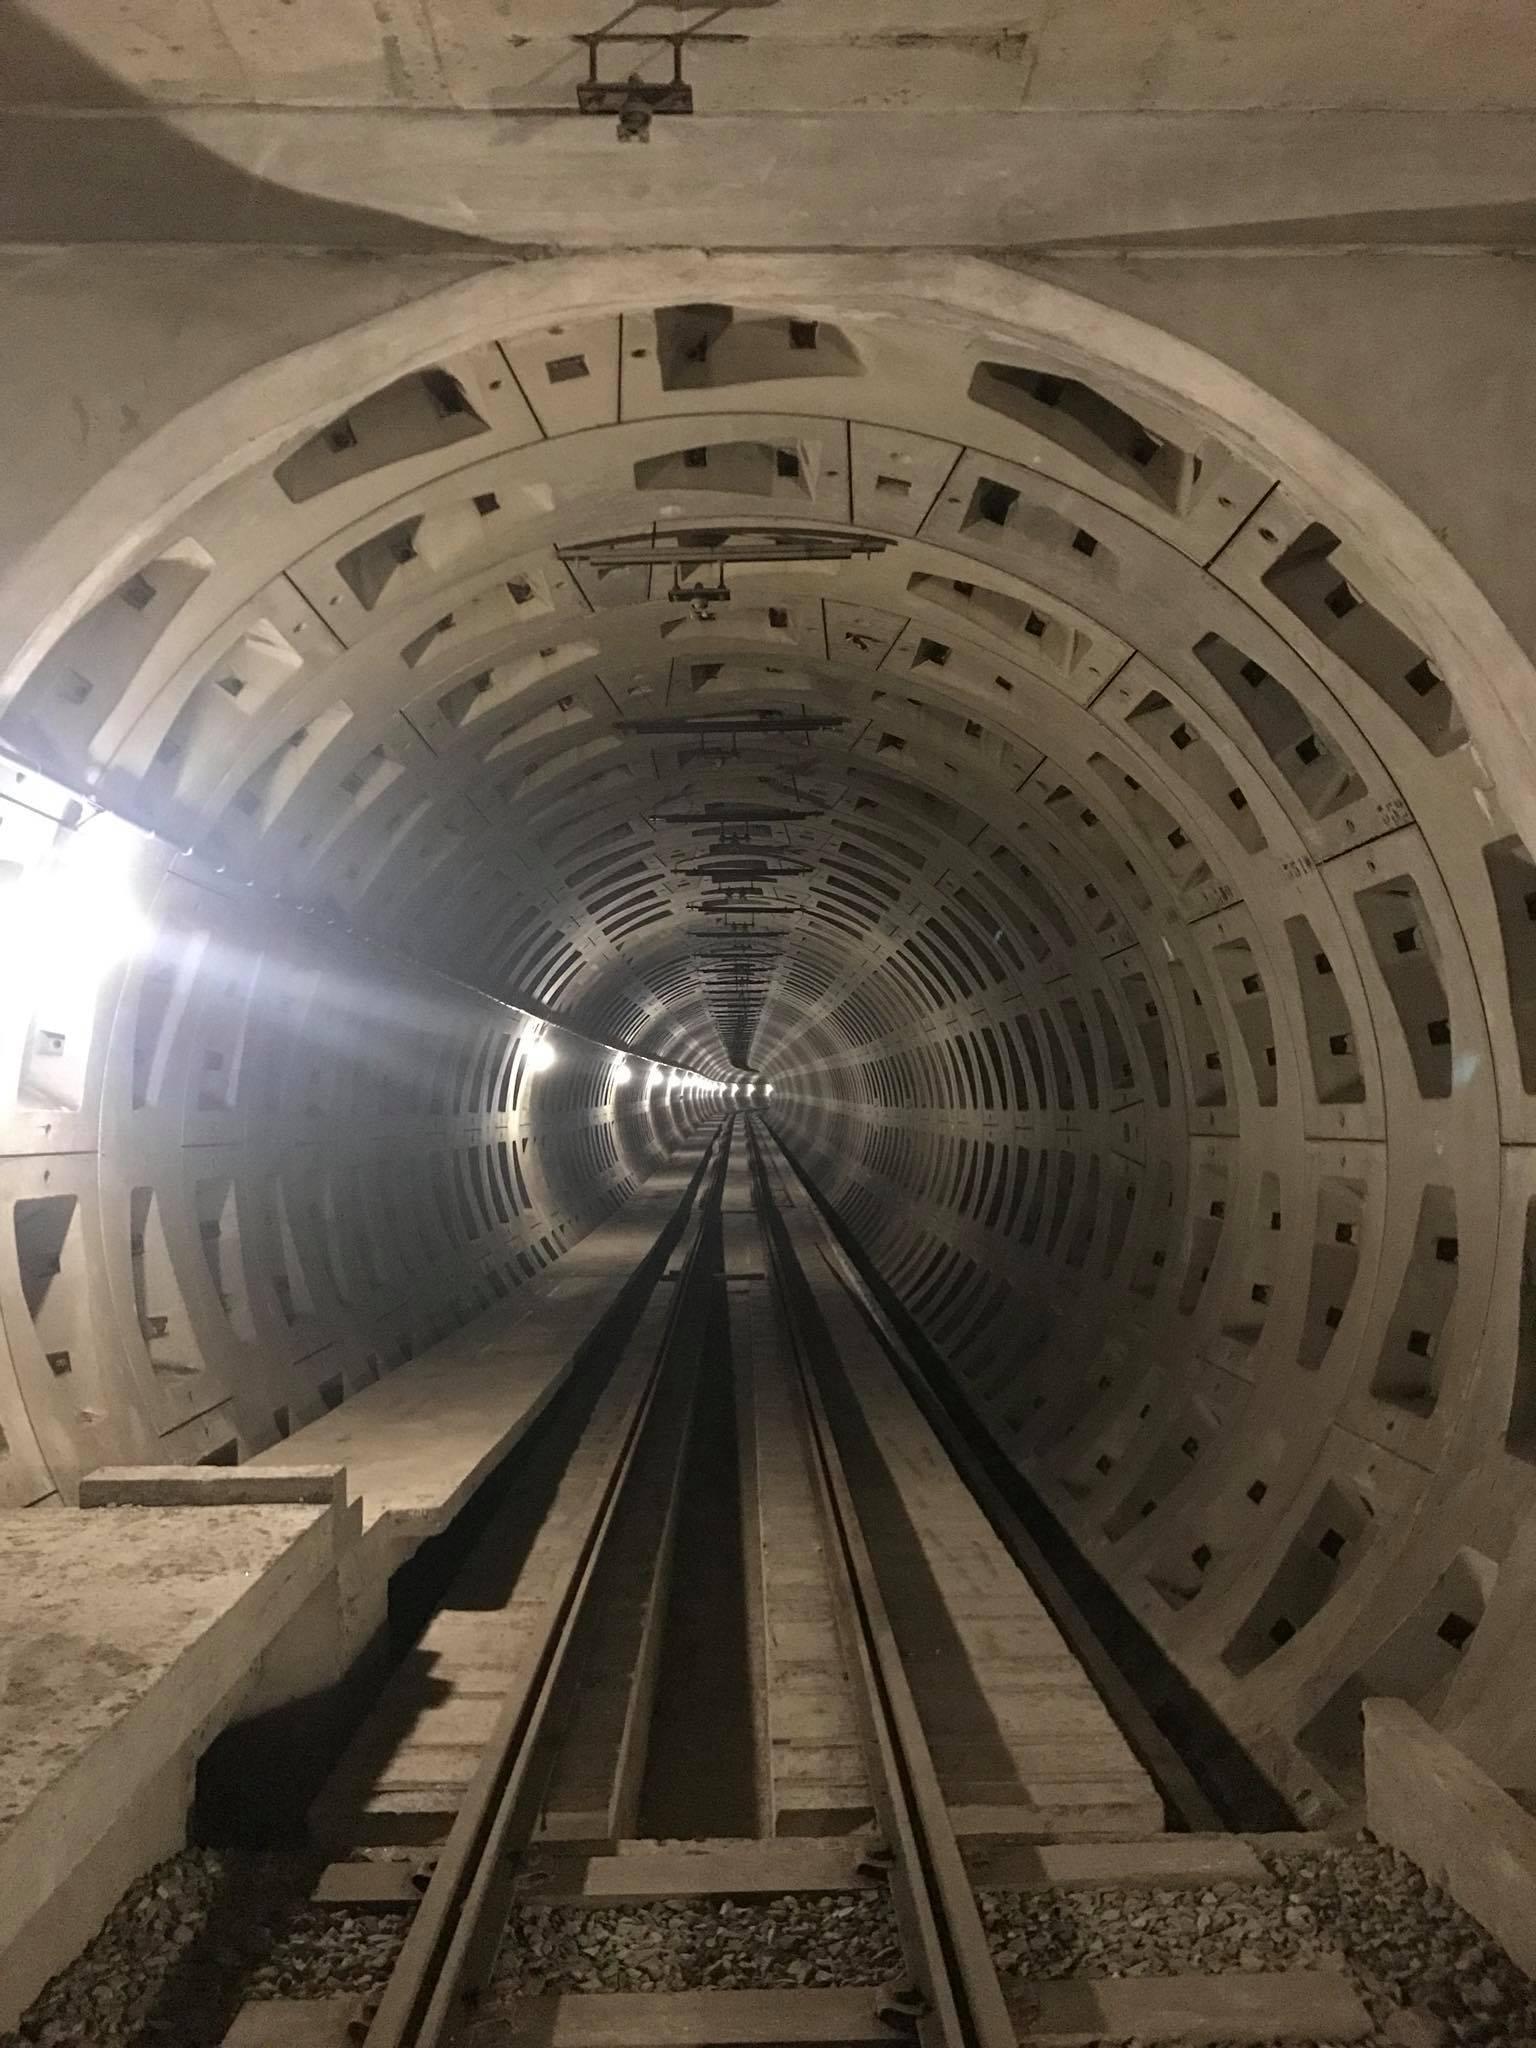 Premetro Antwerpen – Ongebruikte tunnel Kerkstraat & Pothoekstraat